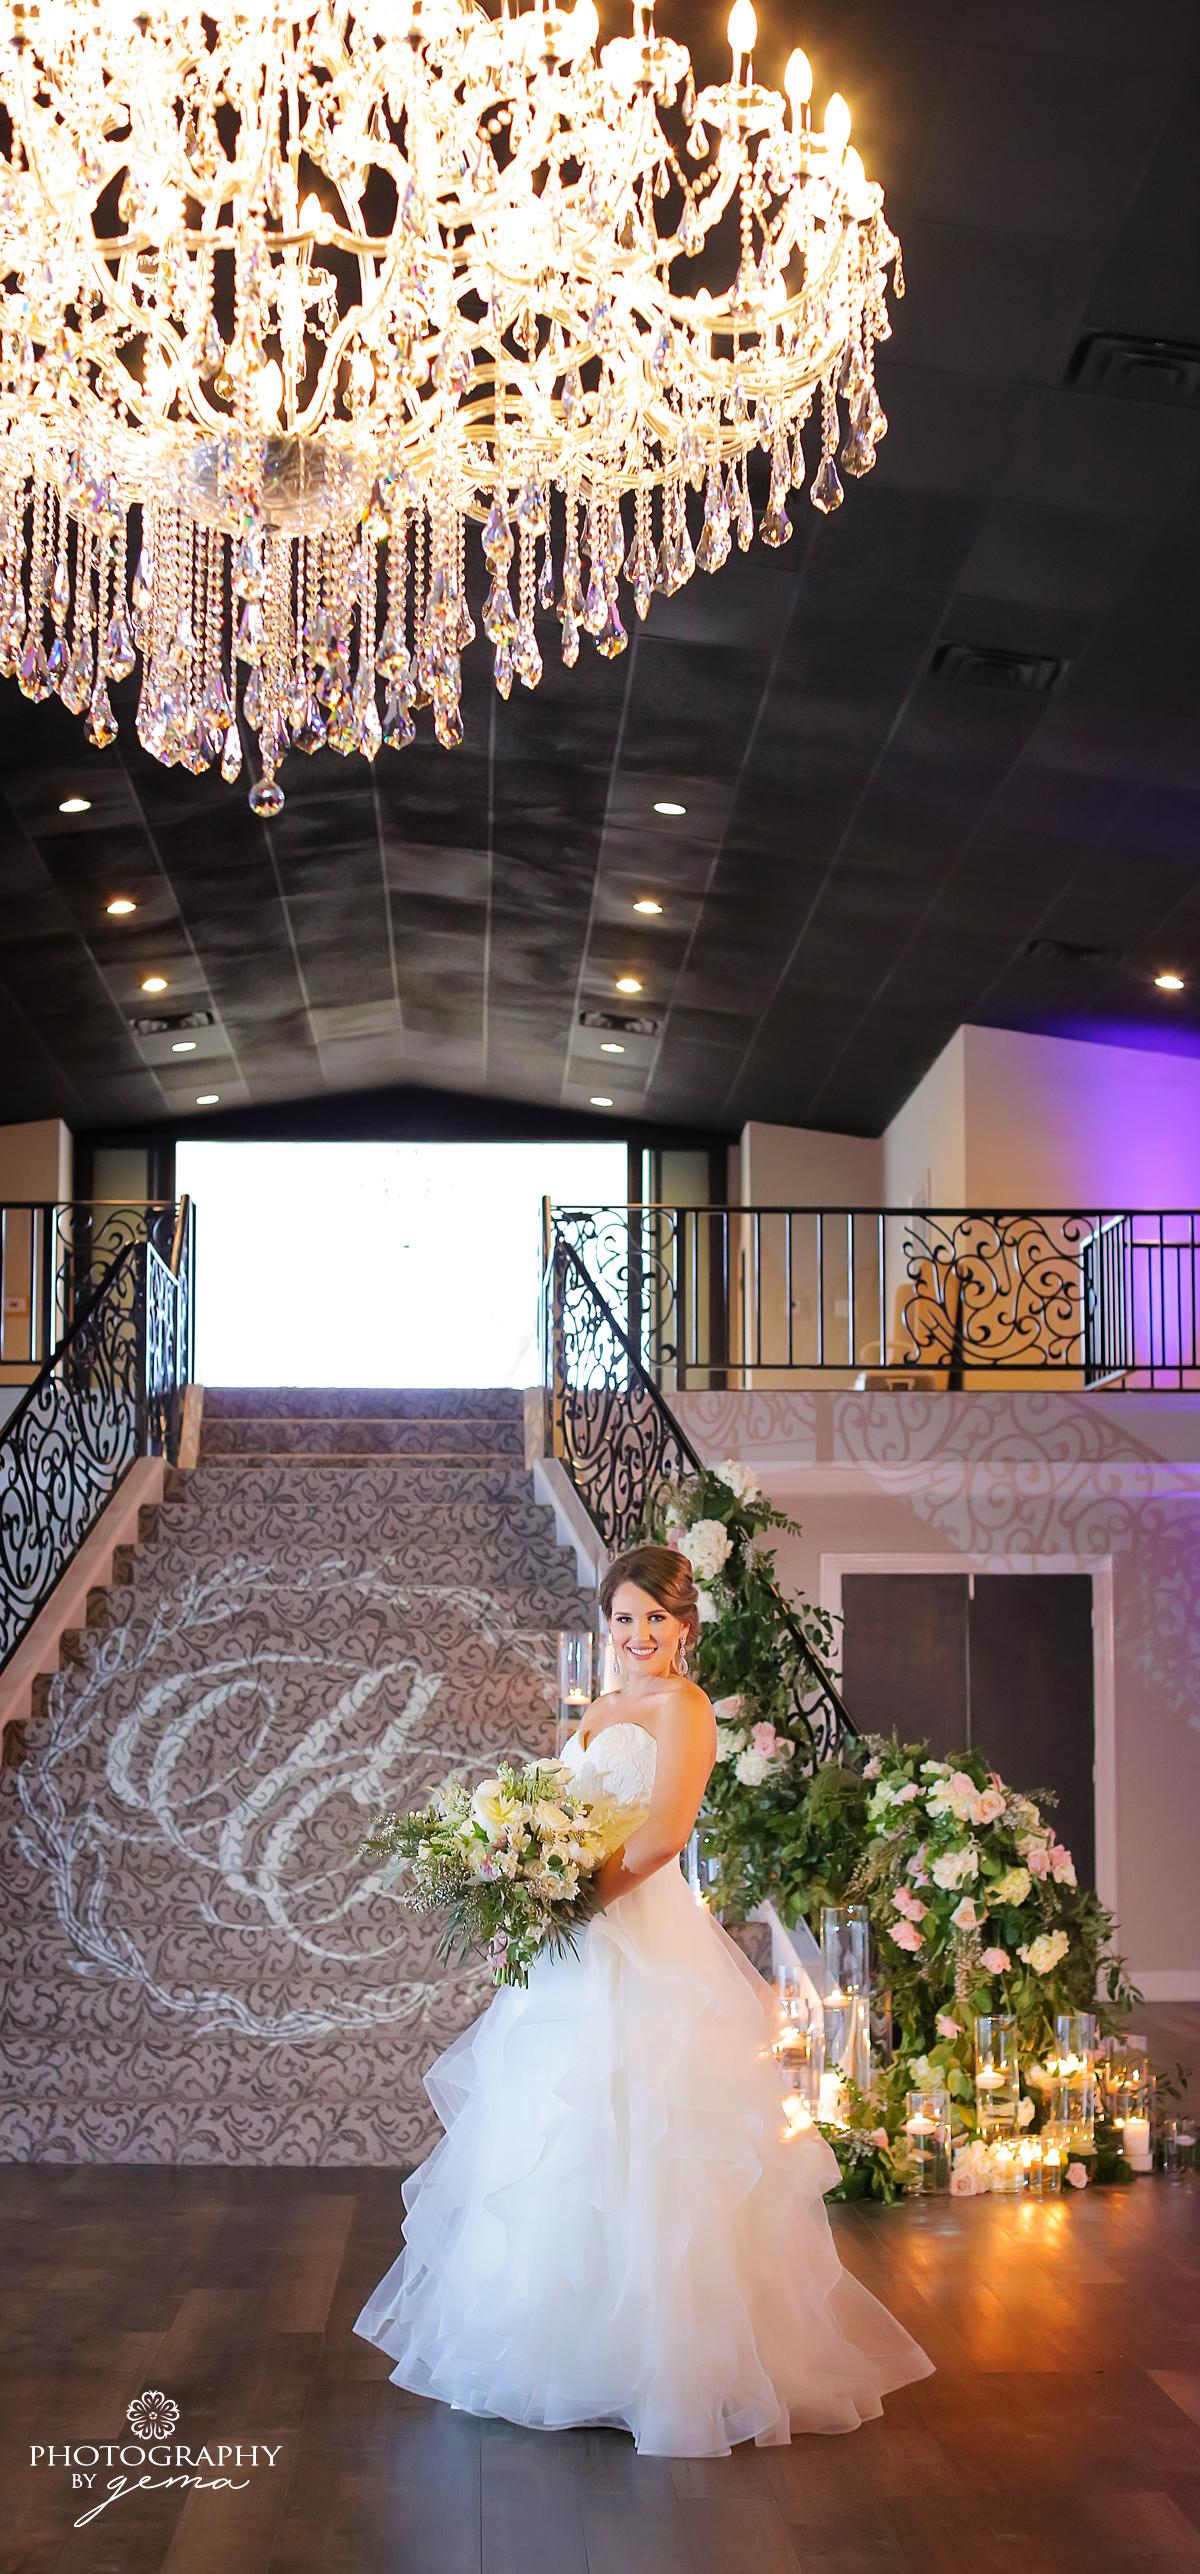 February 20 2018 Weddingsphotosgema